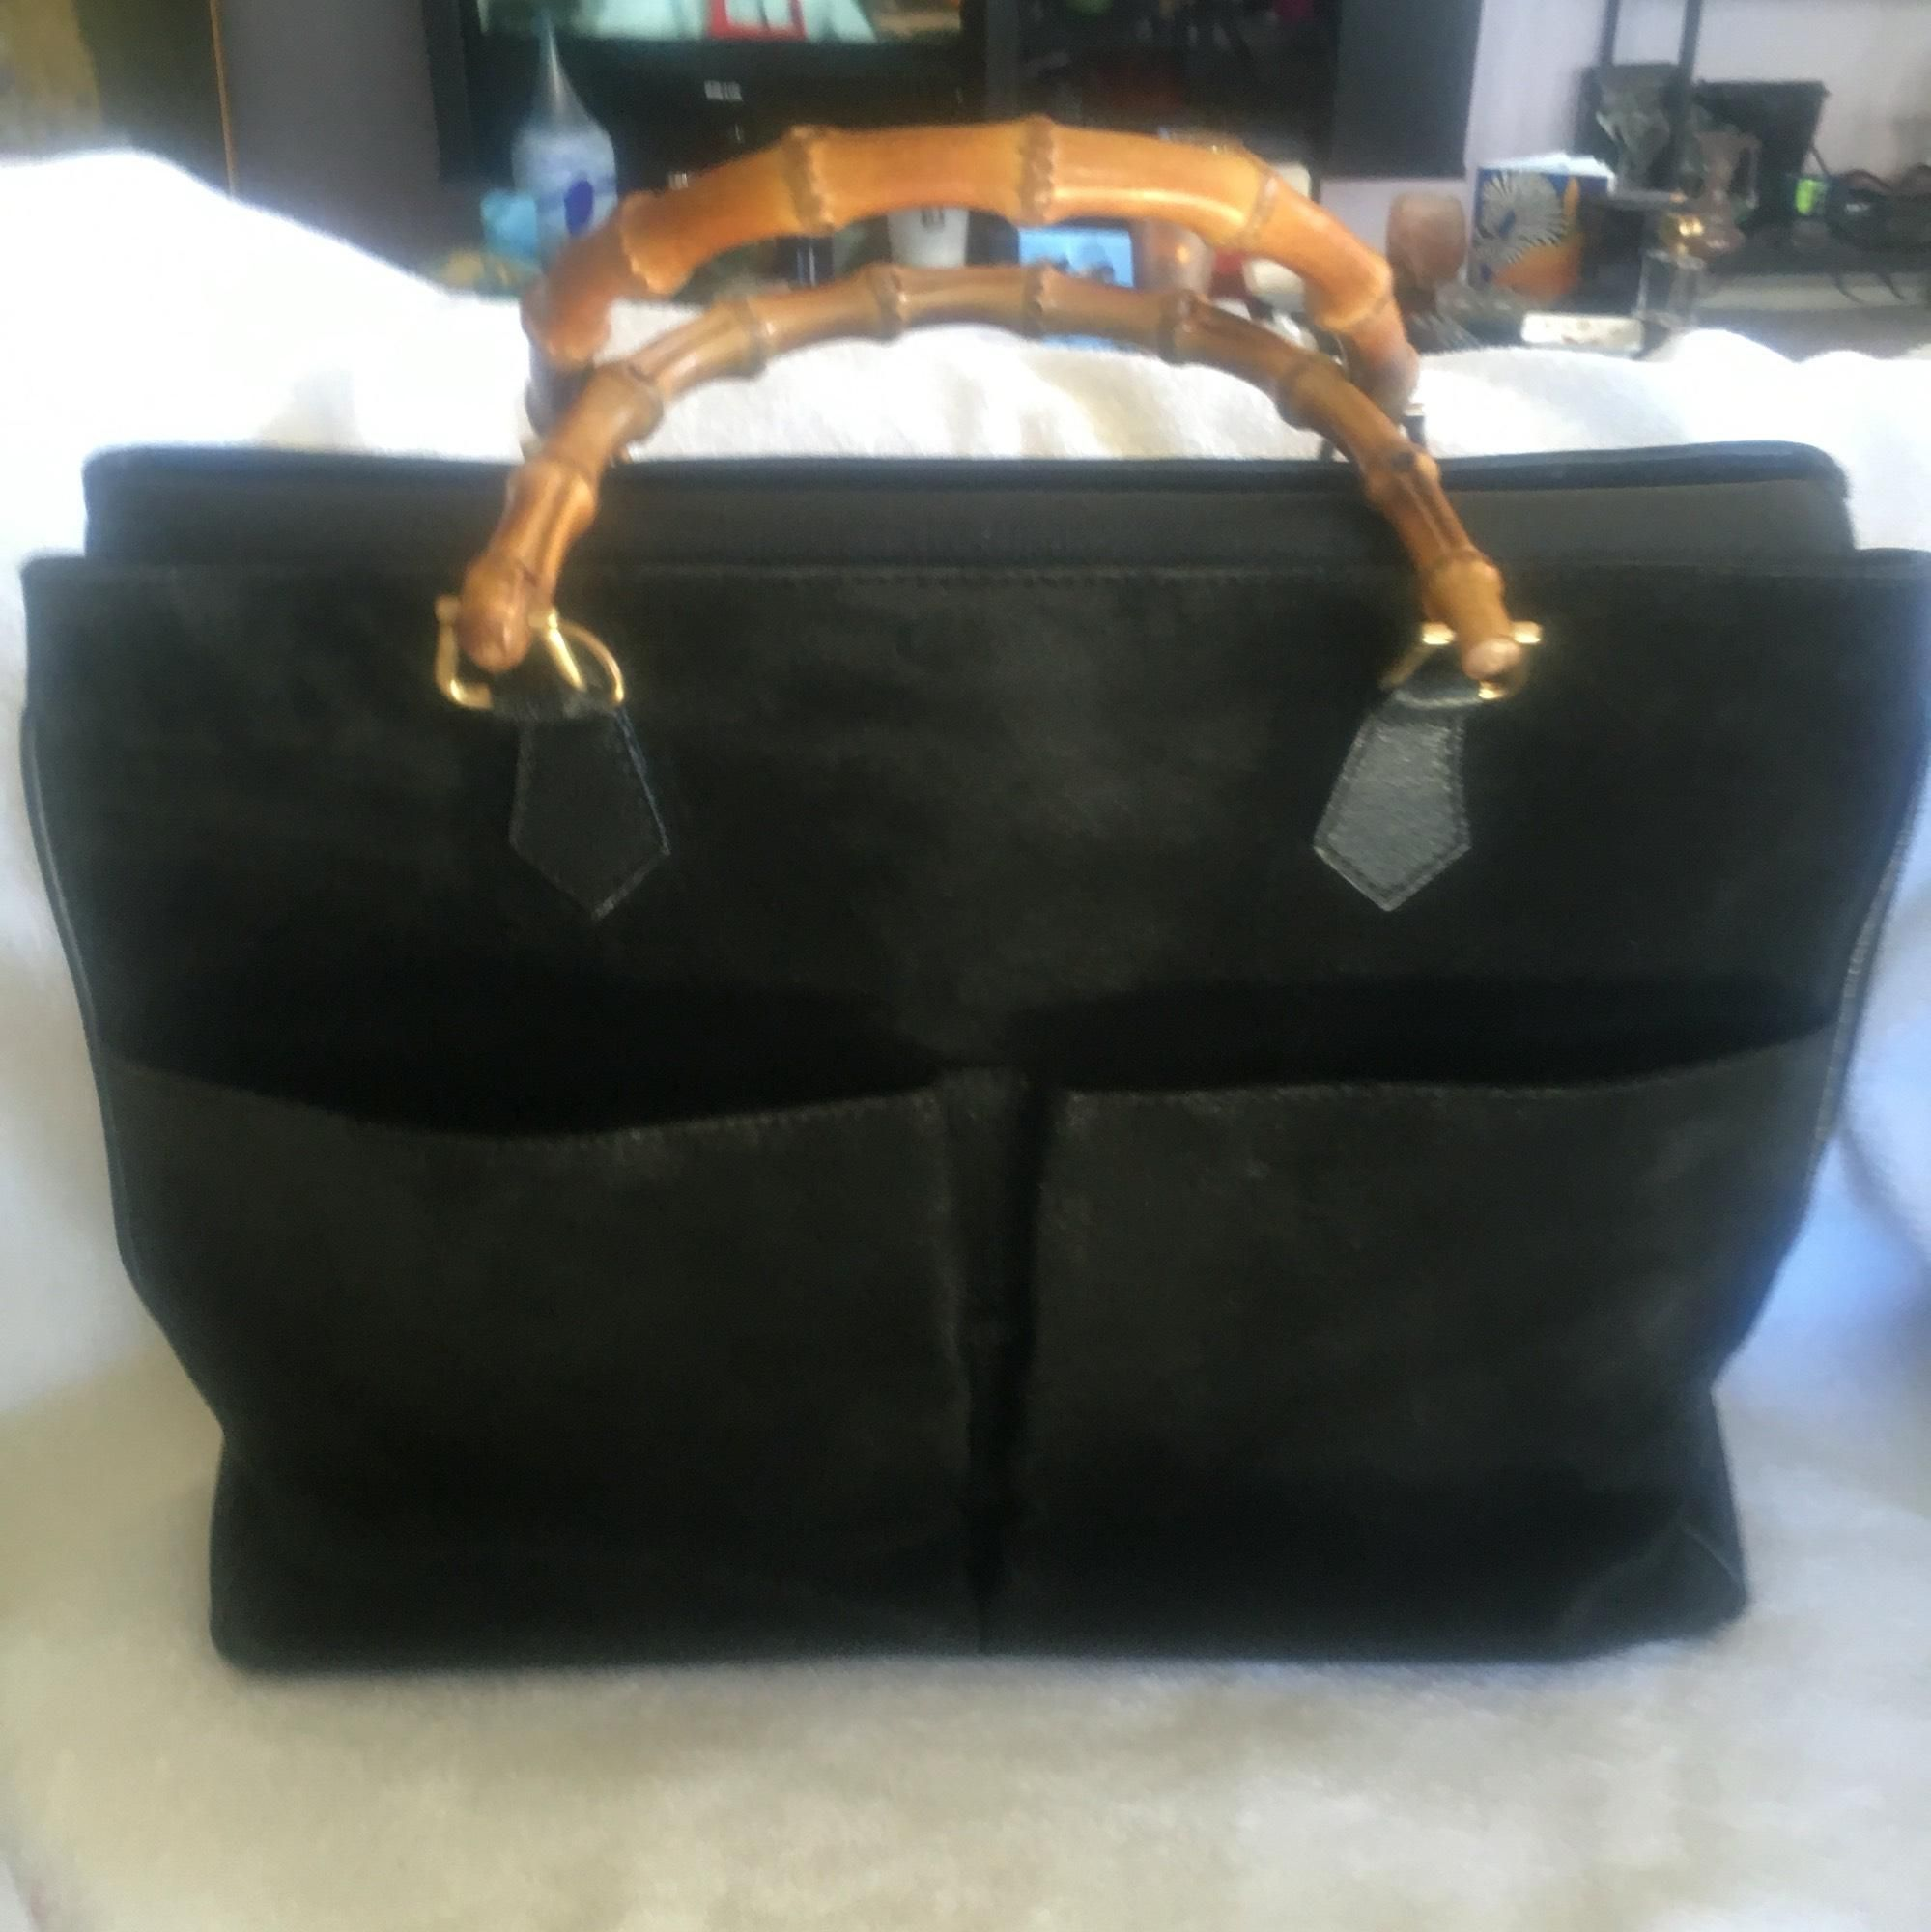 b0e0638da50 Gucci Bamboo Handle 2way Hand Vintage Black Tote Bag.